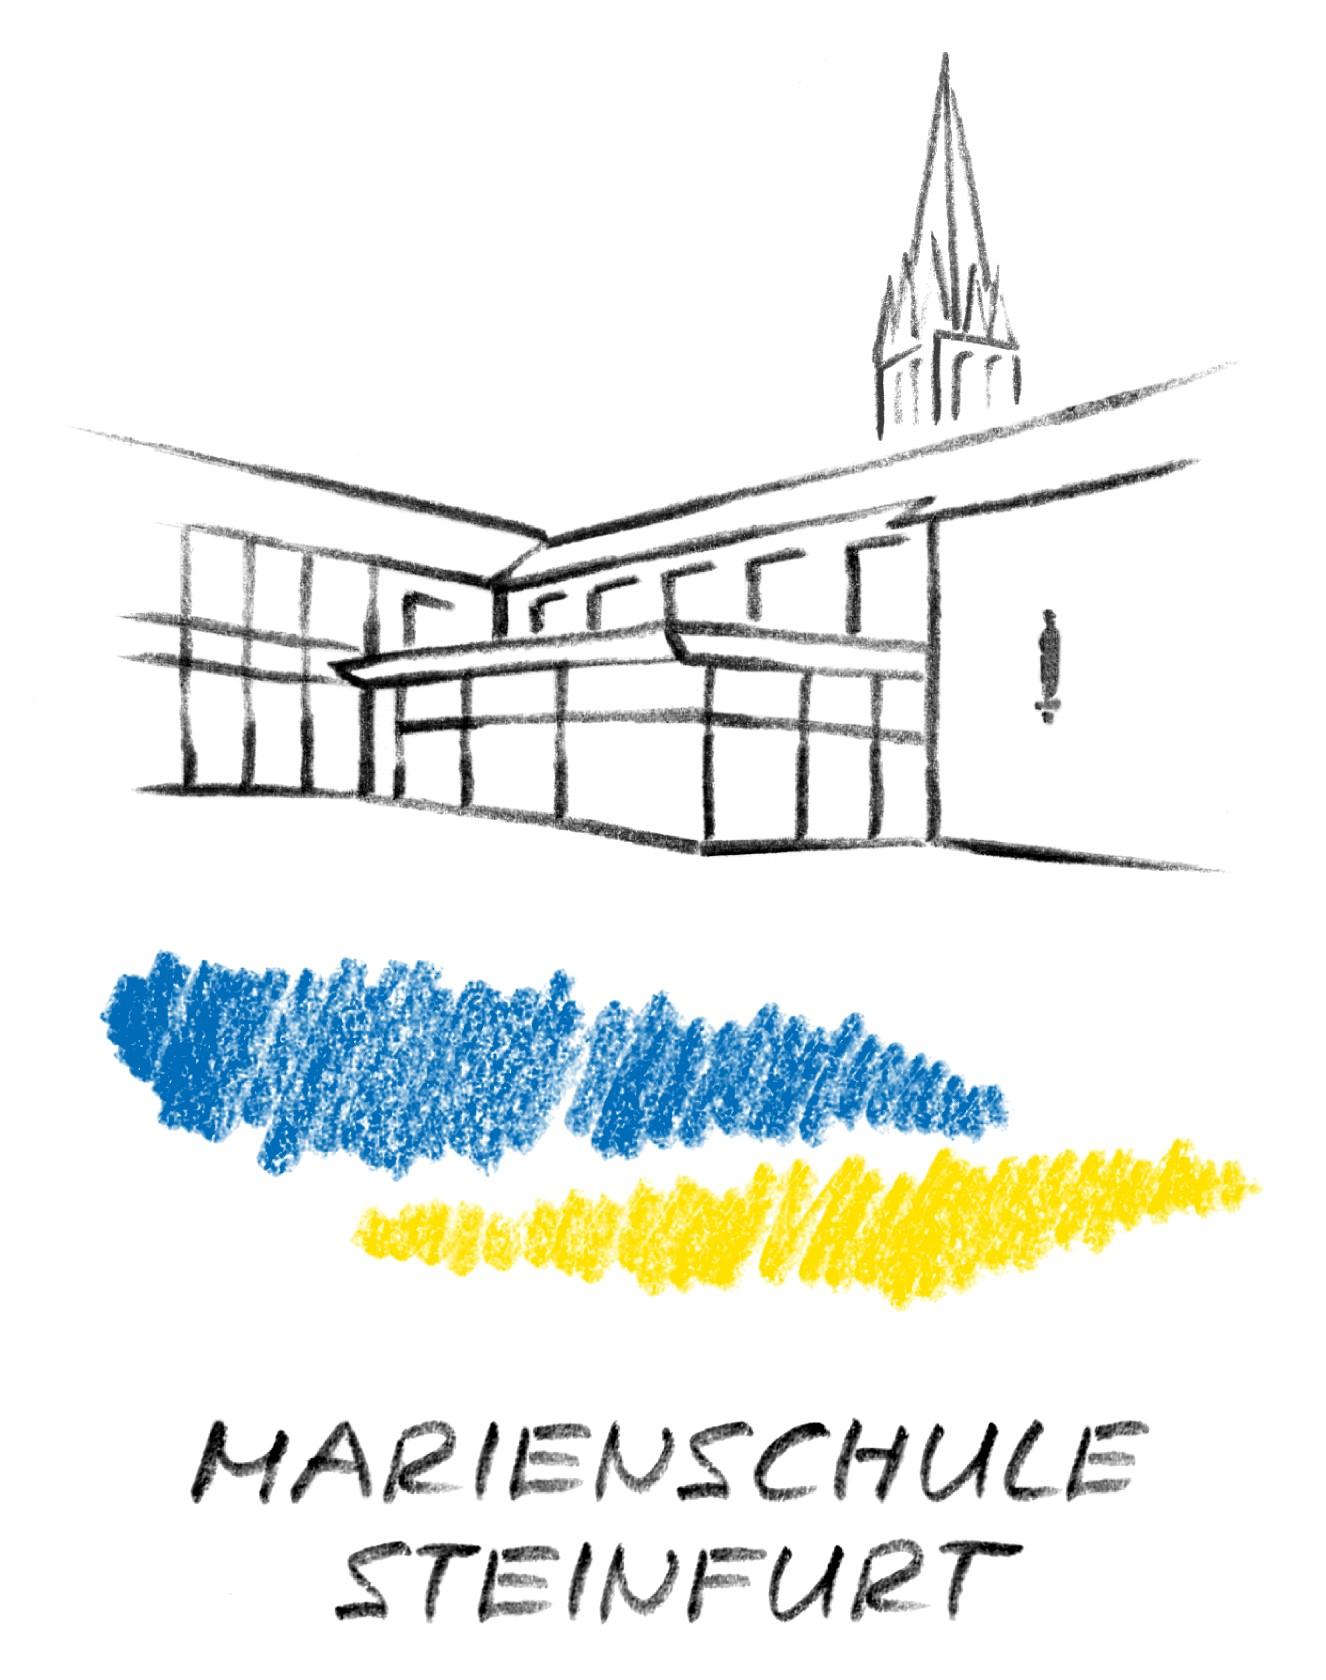 Marienschule Steinfurt